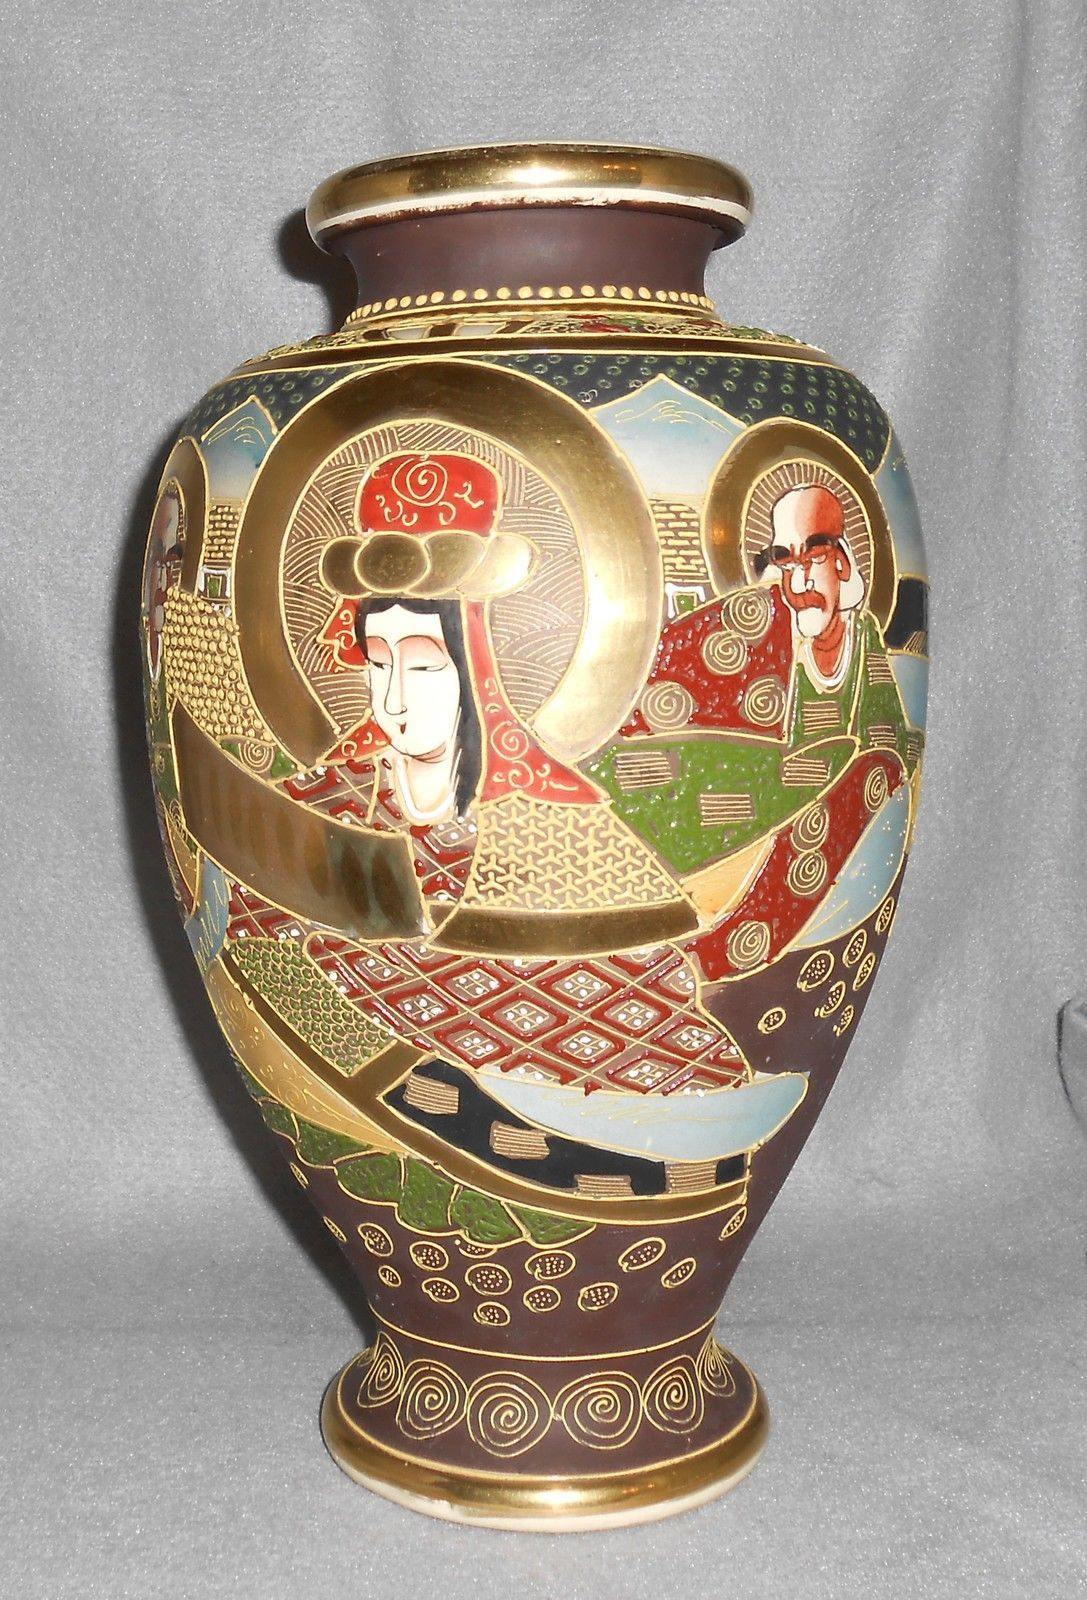 Antique satsuma porcelain vase mt fuji warriors samurai ie antique satsuma porcelain vase mt fuji warriors samurai iepicclick reviewsmspy